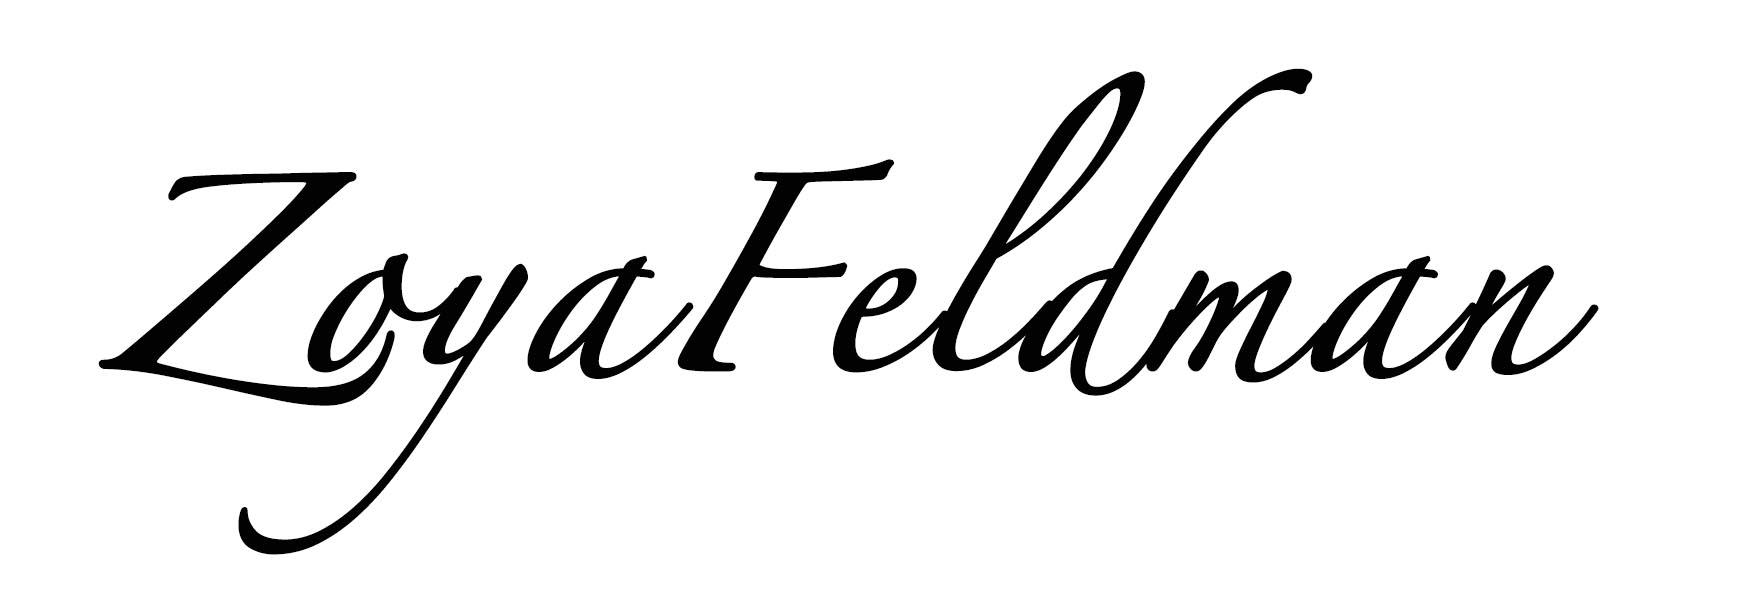 Zoya Feldman's Signature